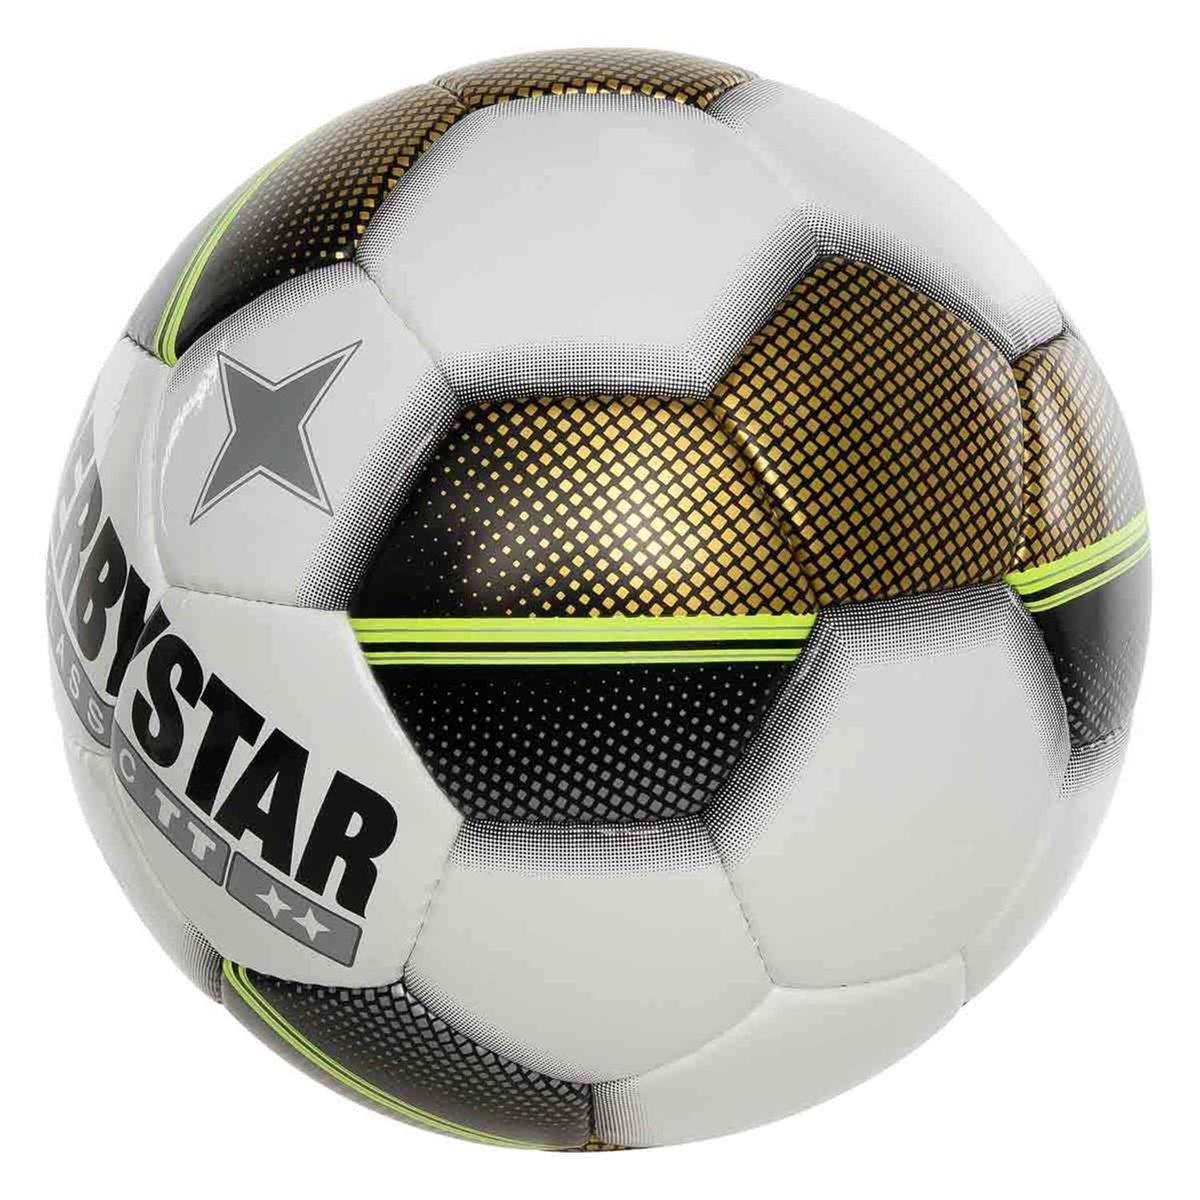 Derbystar Classic TT 5 Voetbal - Multi Kleuren - 3 Vak Goud - Maat 5 - Derbystar